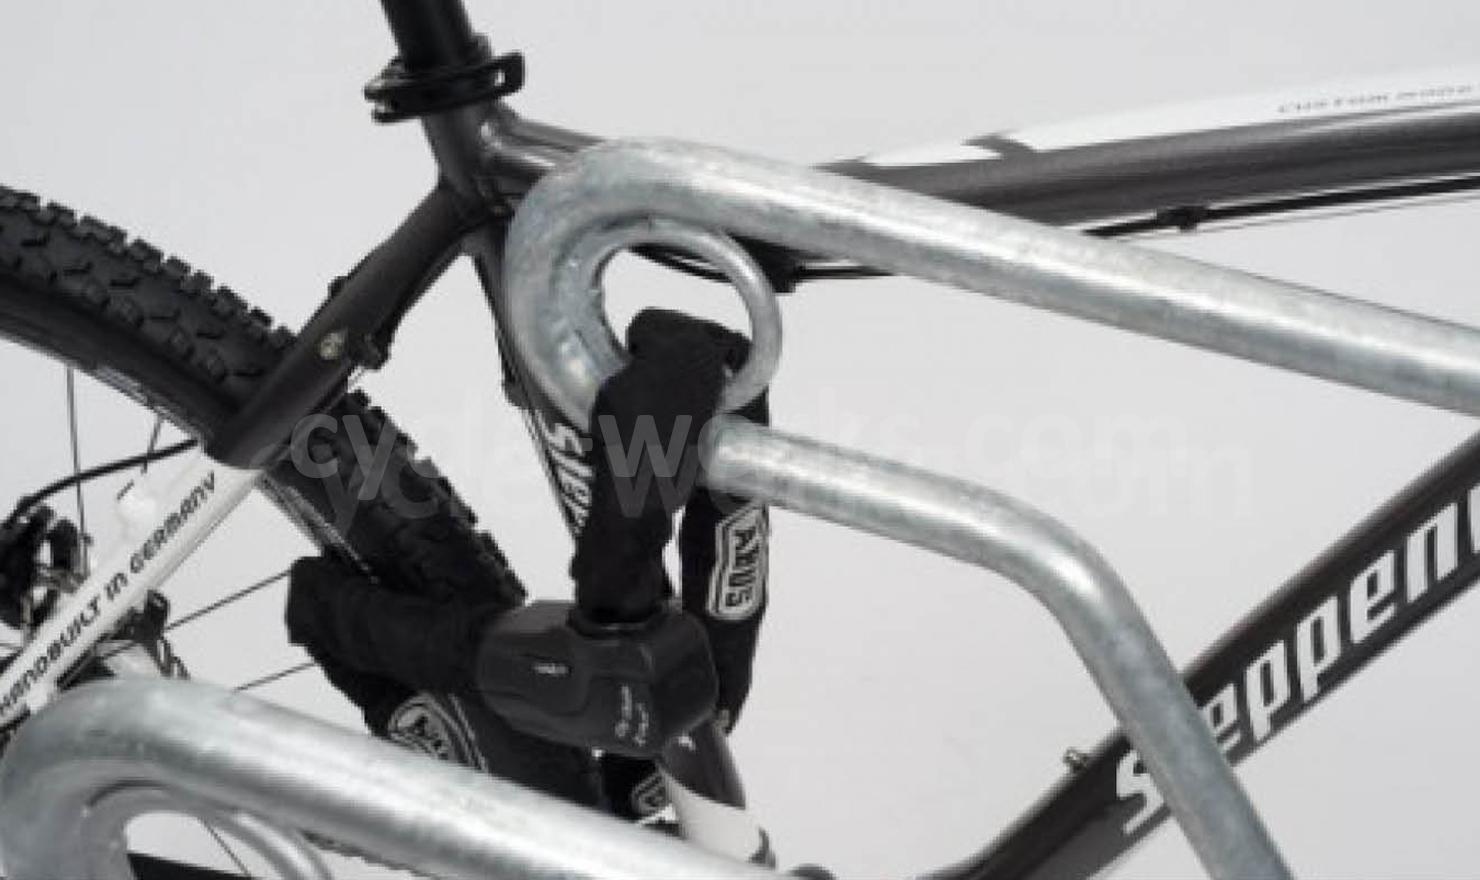 Bike Locked to Kent Cycle Rack